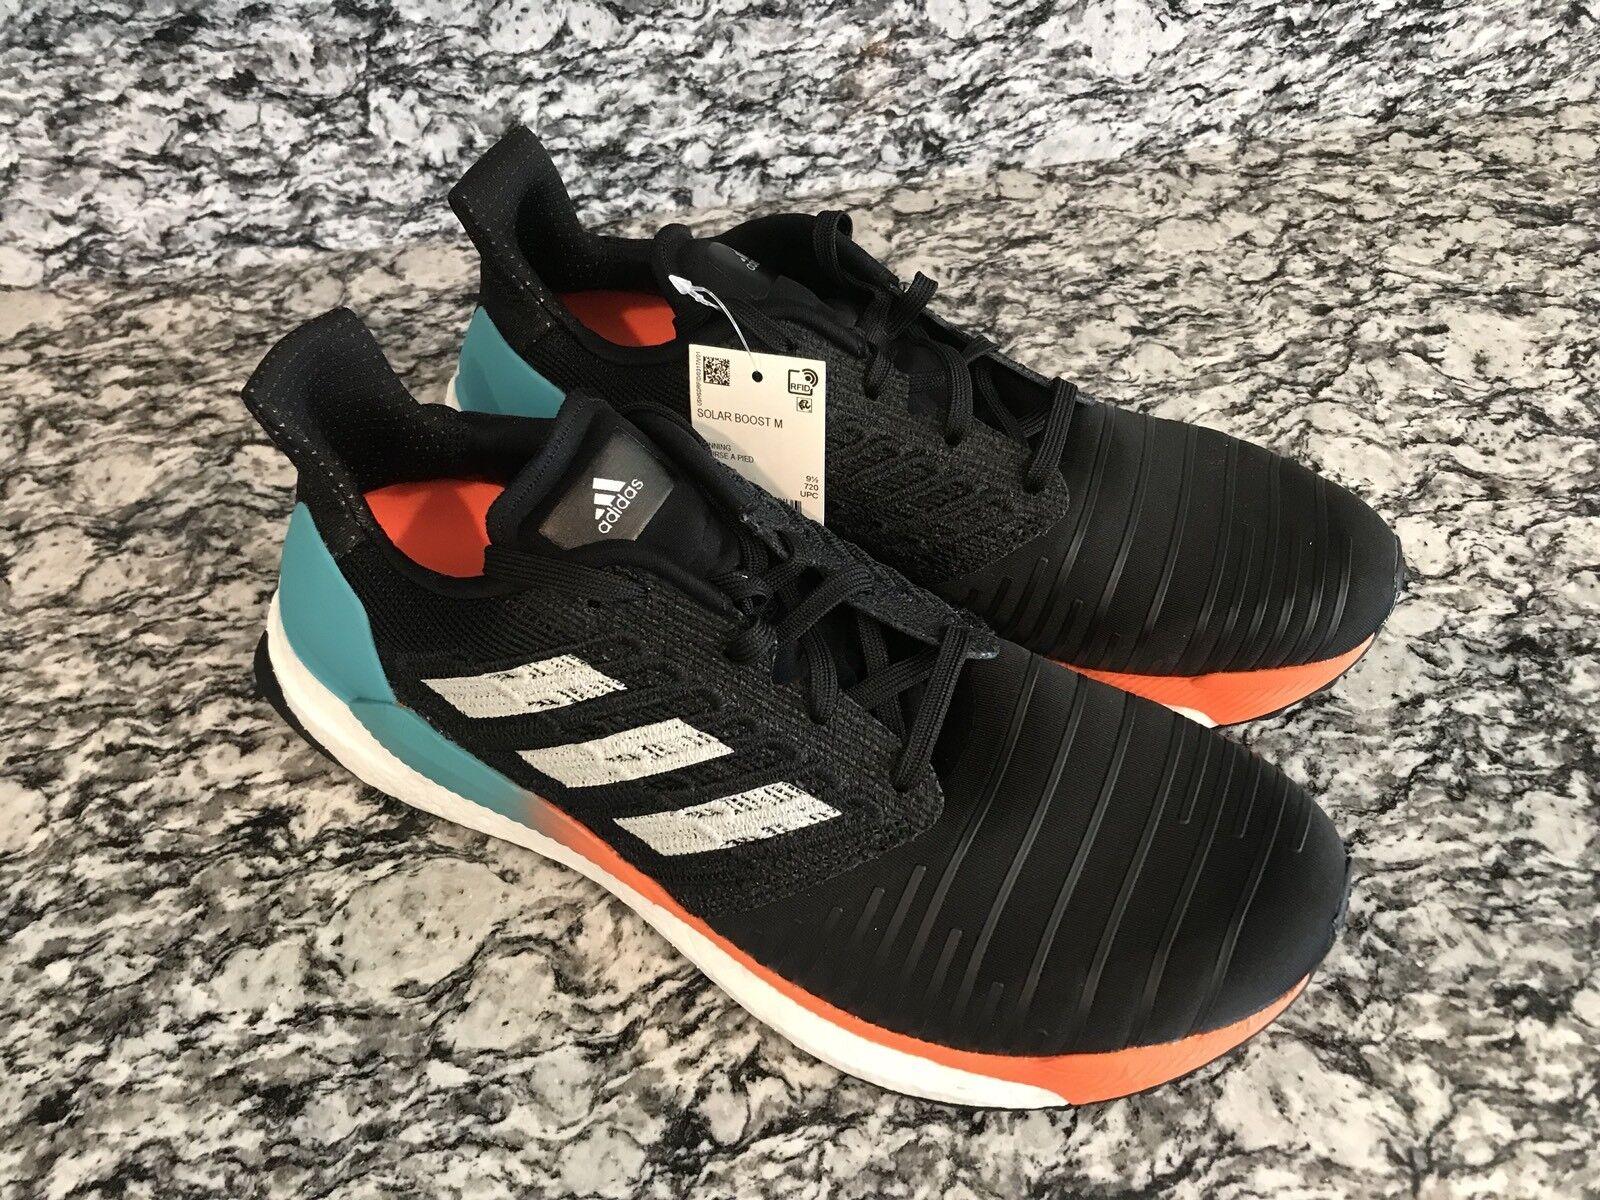 Adidas Adidas Adidas solar impuls m hi - res - aqua schwarz - grauen männer sz 8,5 laufschuhe cq3168 5b9239